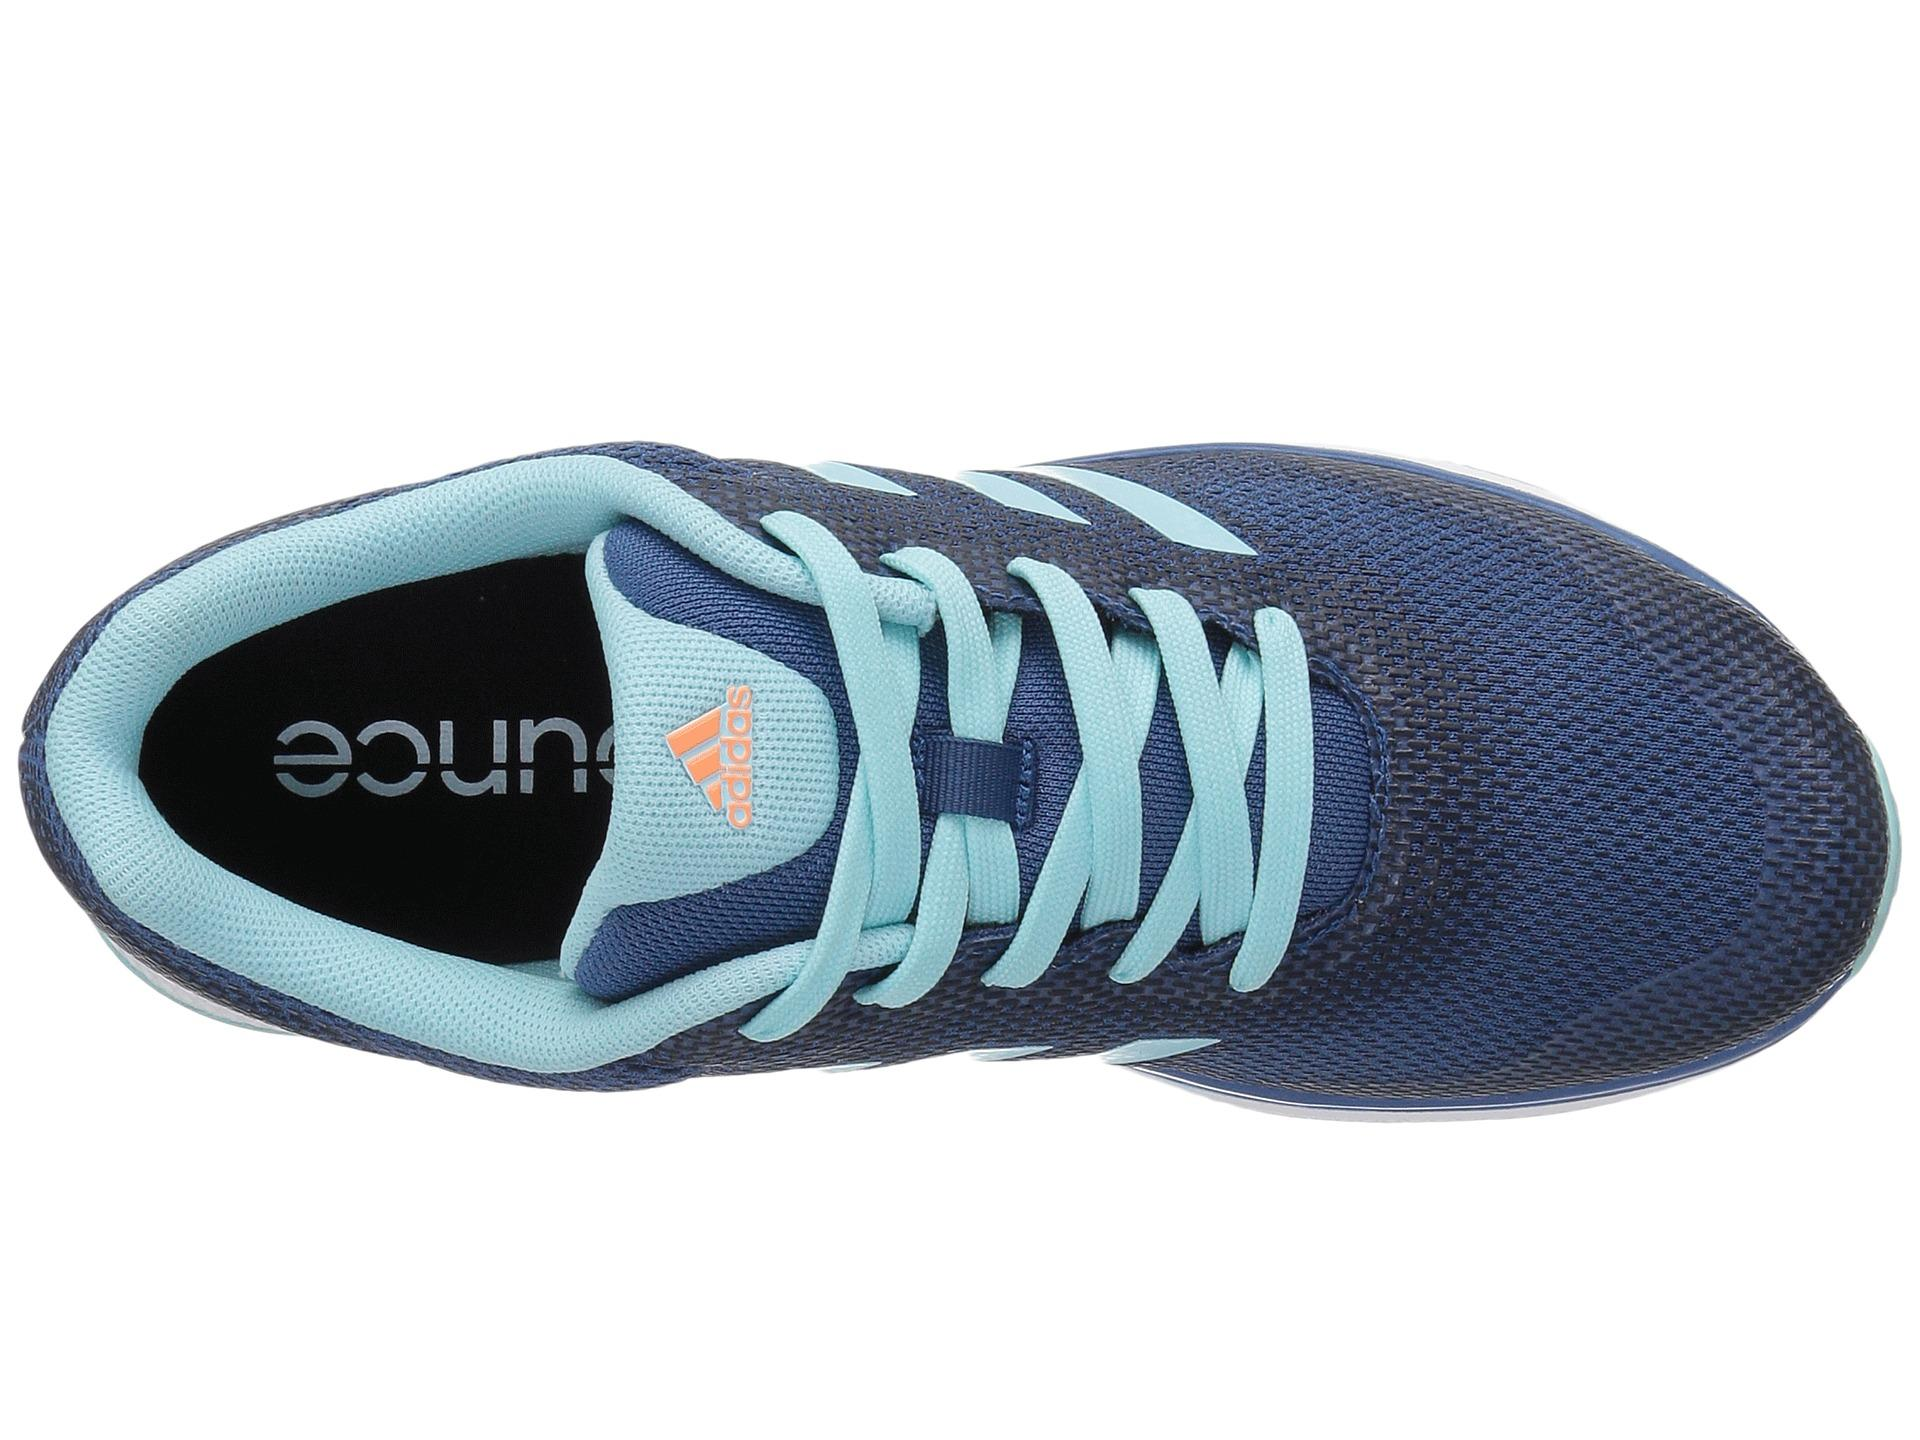 21692537d Lyst - adidas Originals Mana Bounce 2 - Aramis in Blue for Men